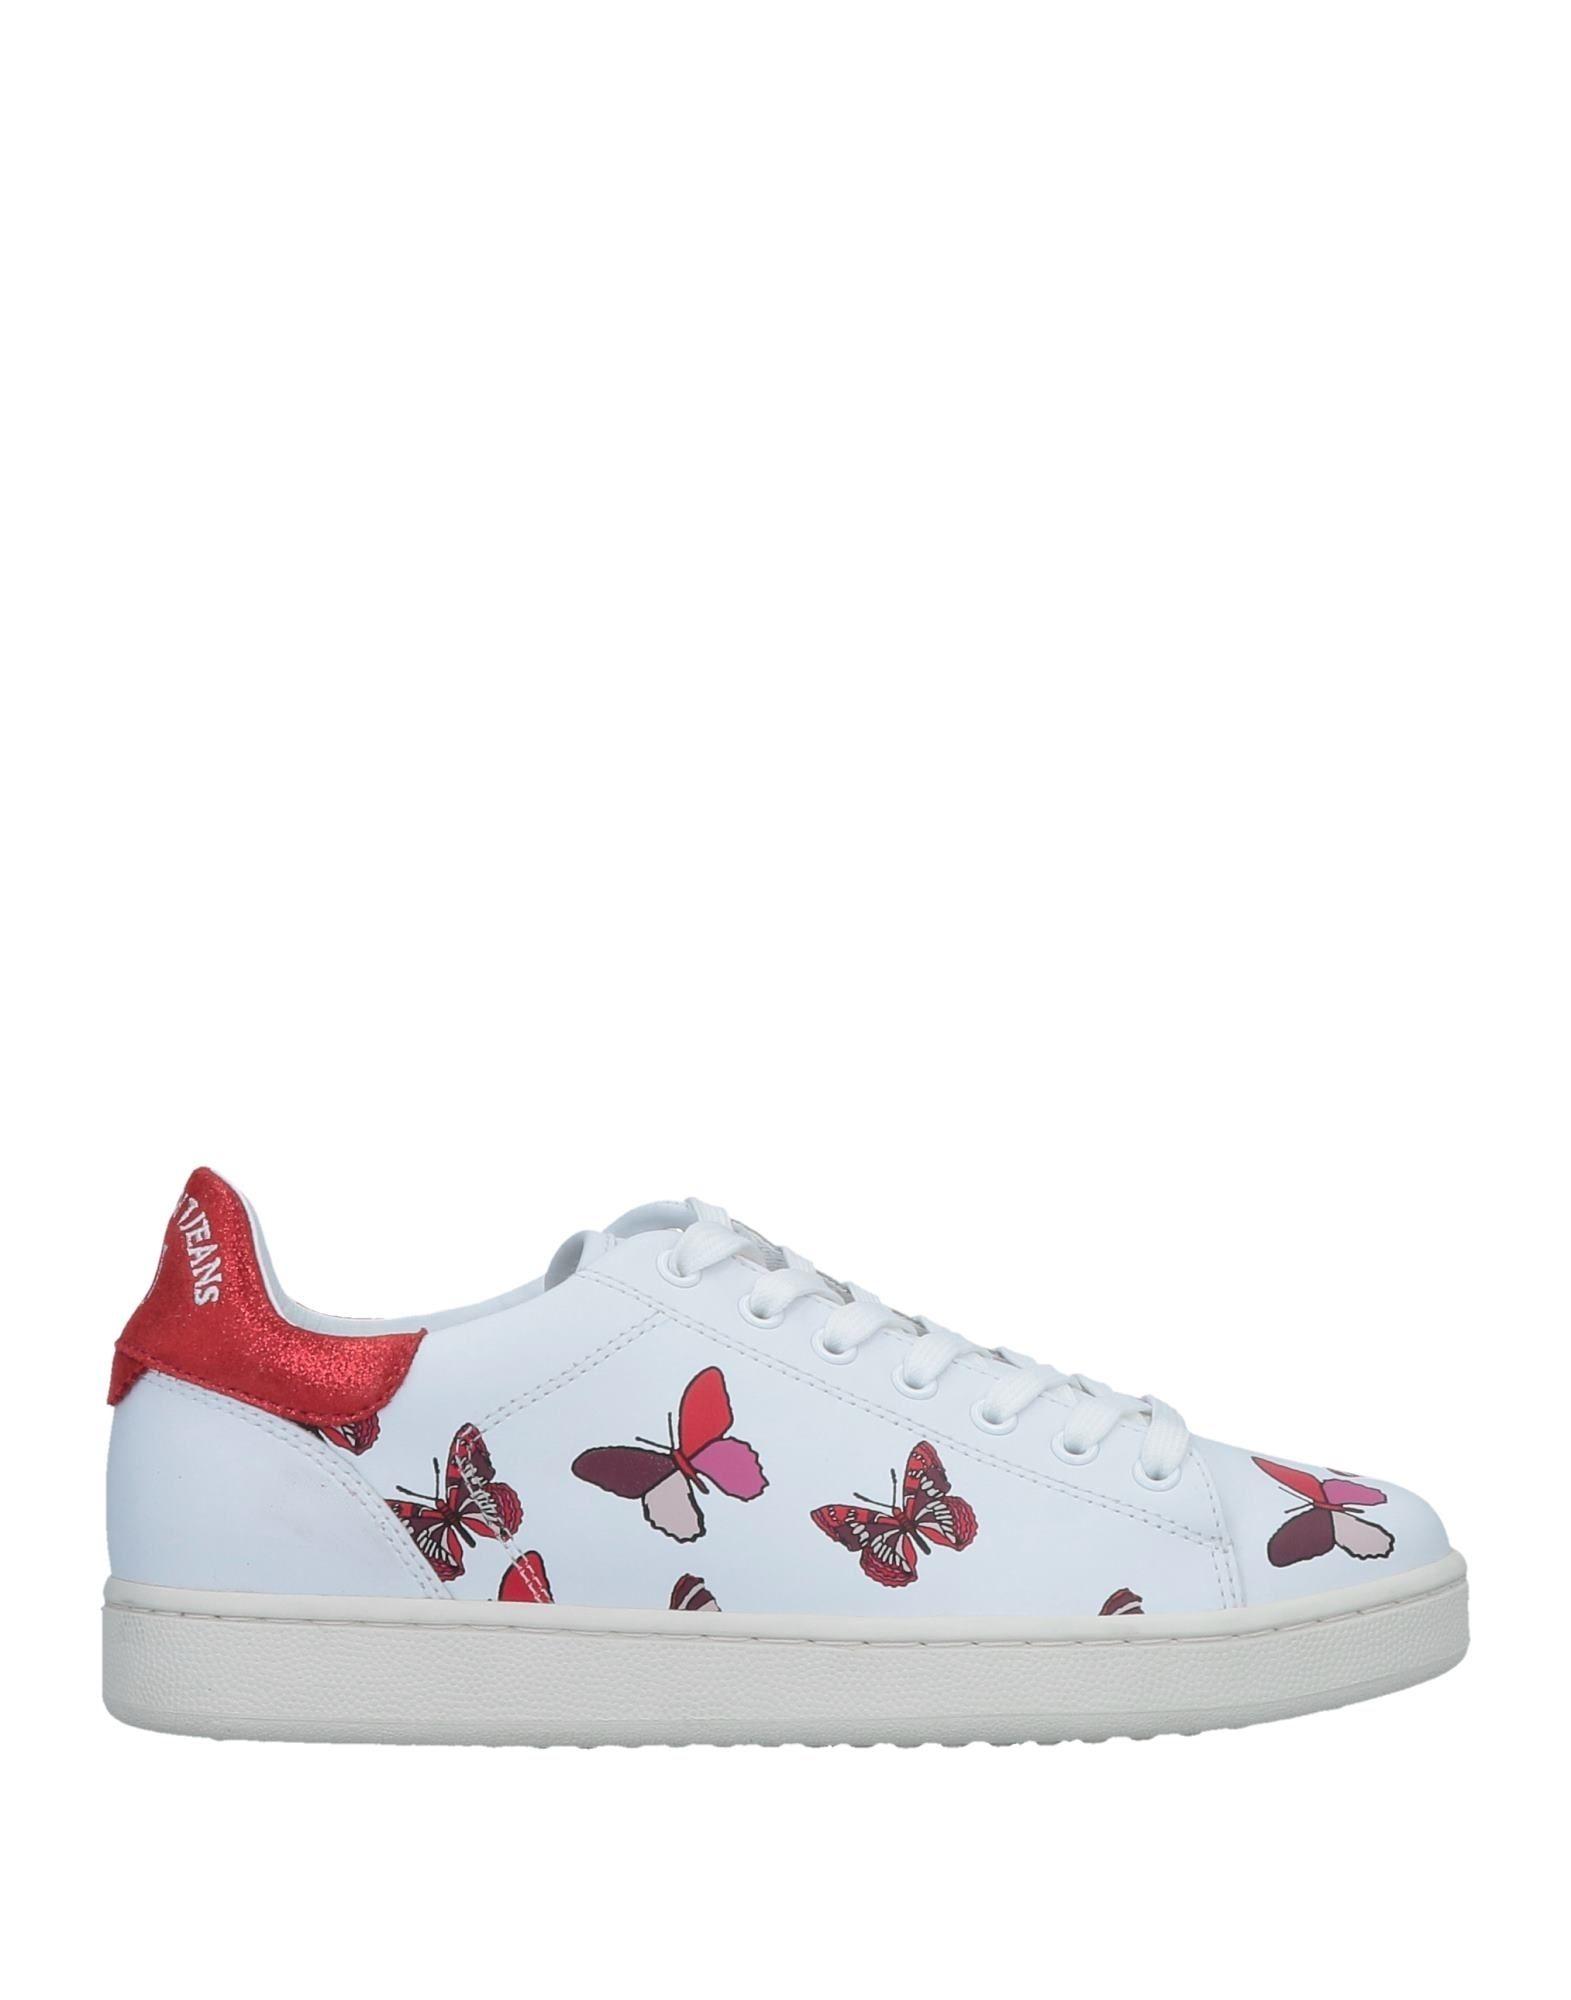 Trussardi Jeans Sneakers Damen  11511228WX Gute Qualität beliebte Schuhe